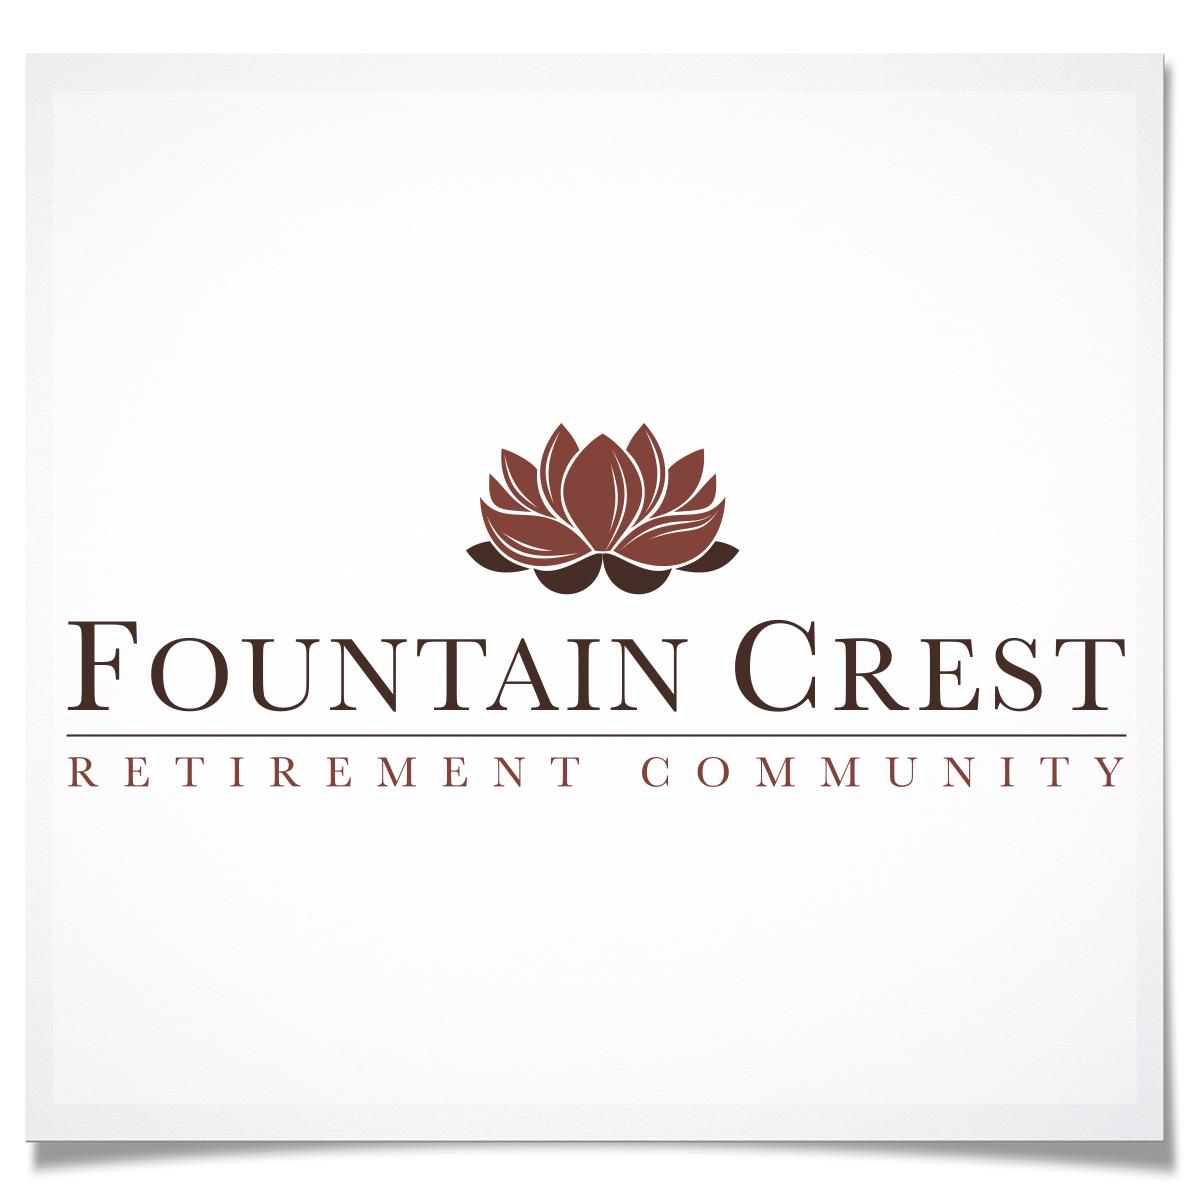 Fountain Crest Retirement Community